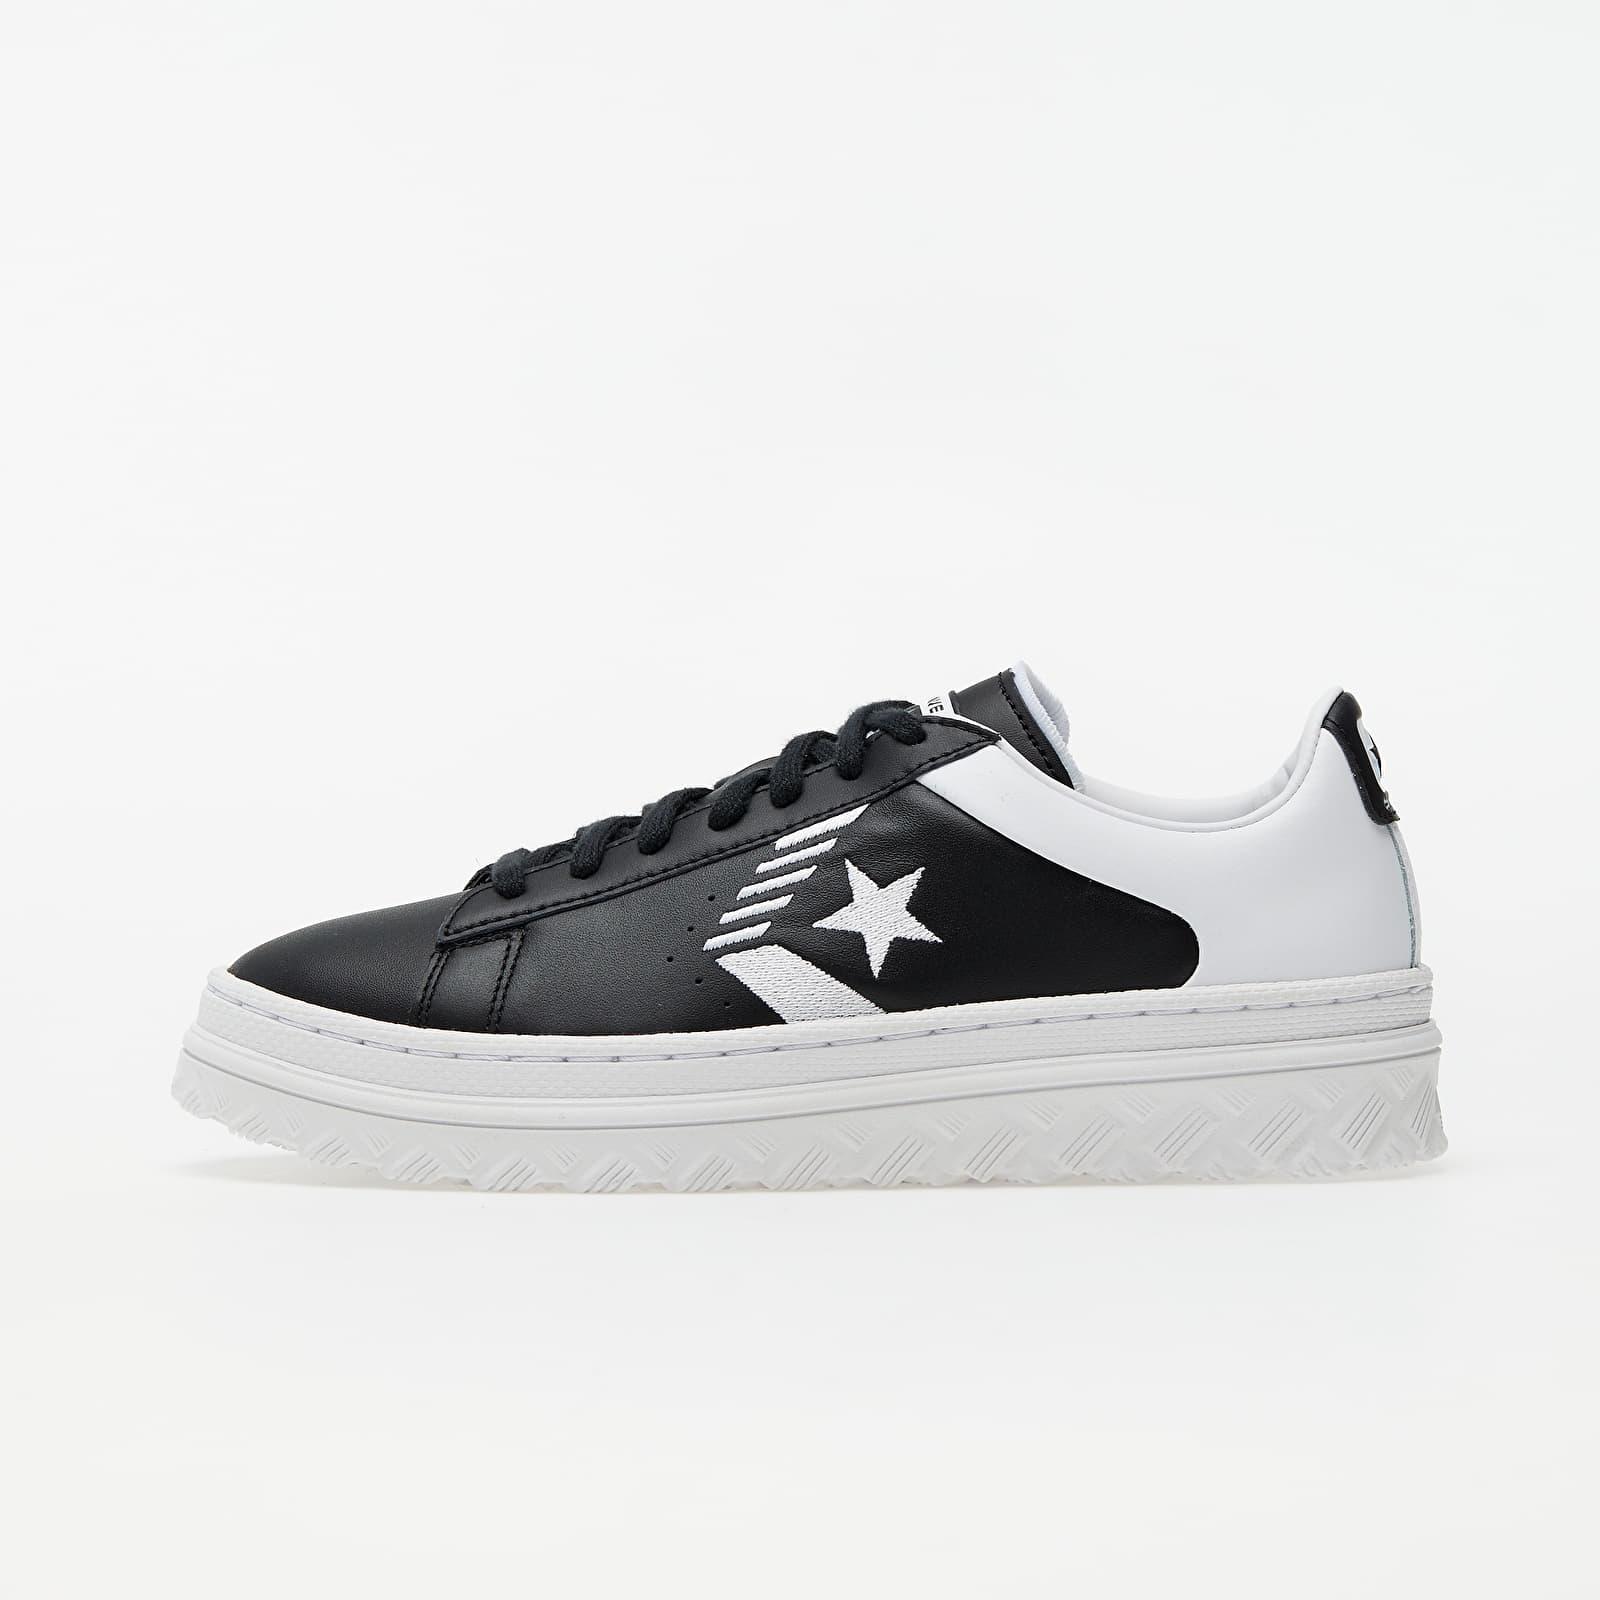 Converse Pro Leather X2 Black/ White/ White 168760C